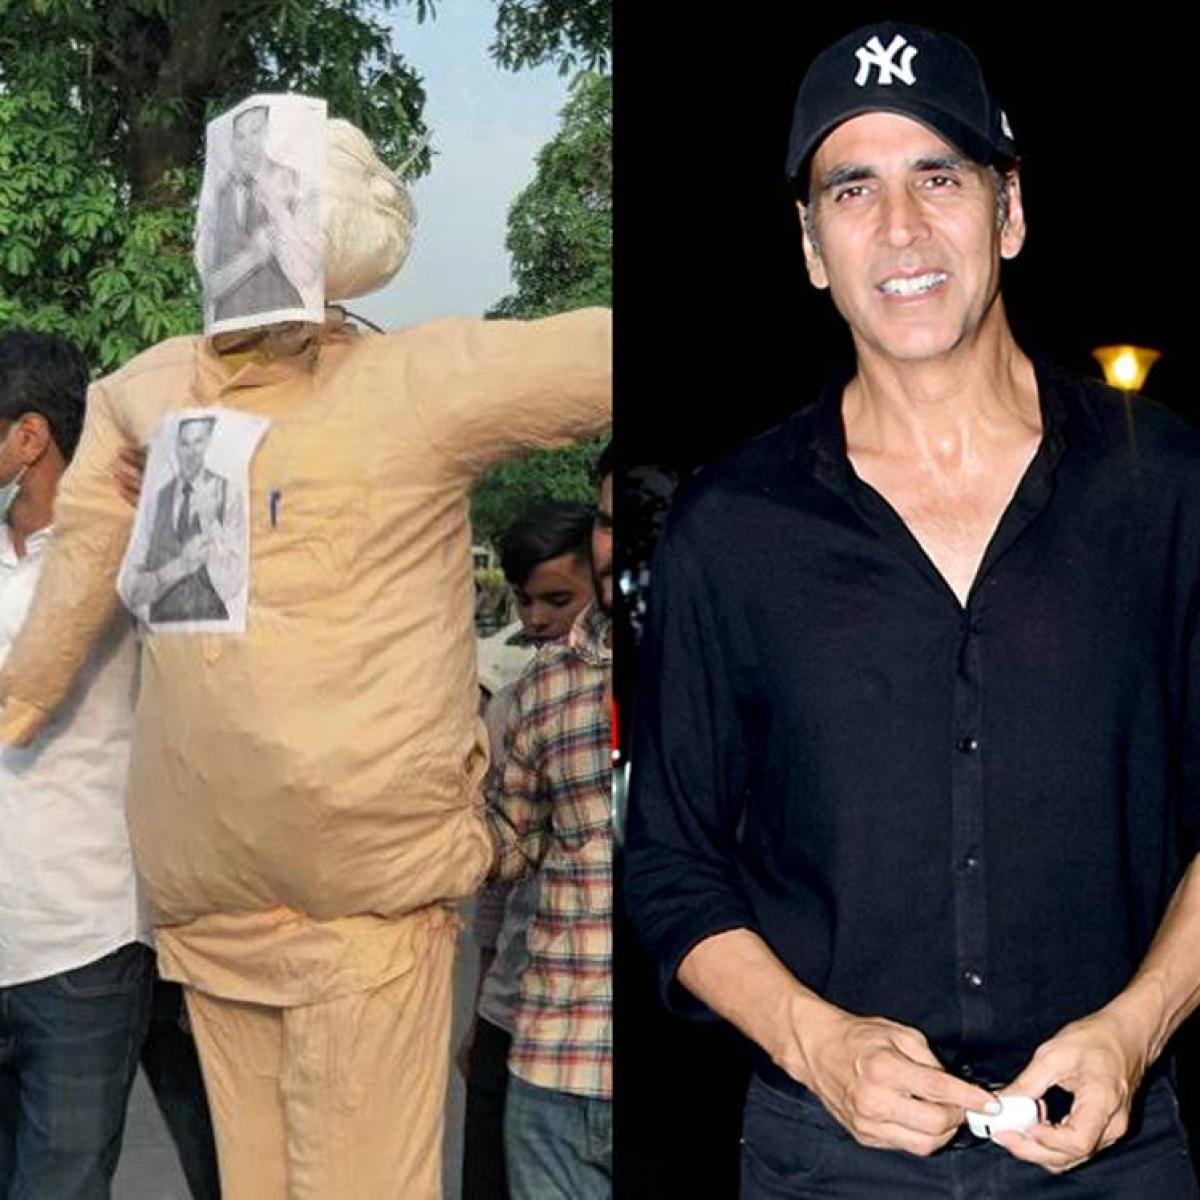 In Pics: Akshay Kumar's effigy burnt in Chandigarh as upcoming film 'Prithviraj' faces backlash